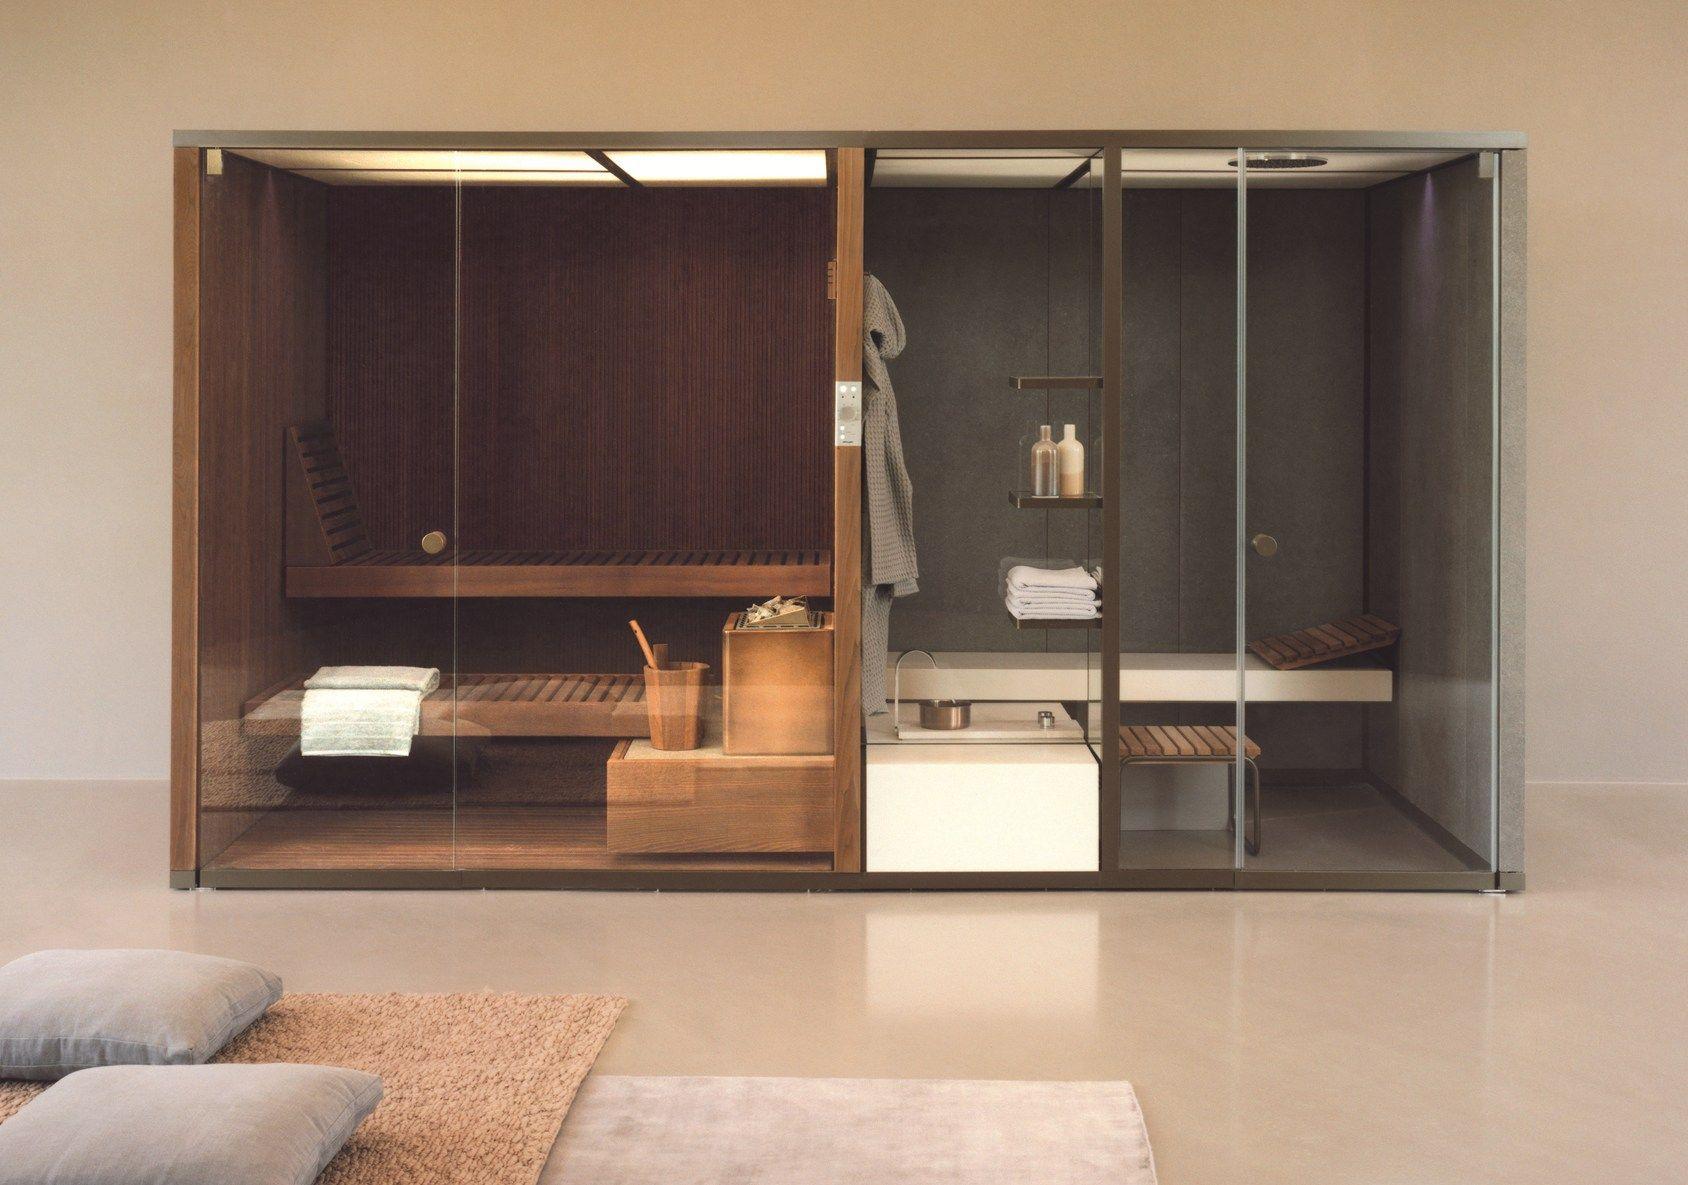 Sauna+Hammam: BodyLove By Rodolfo Dordoni With Michele